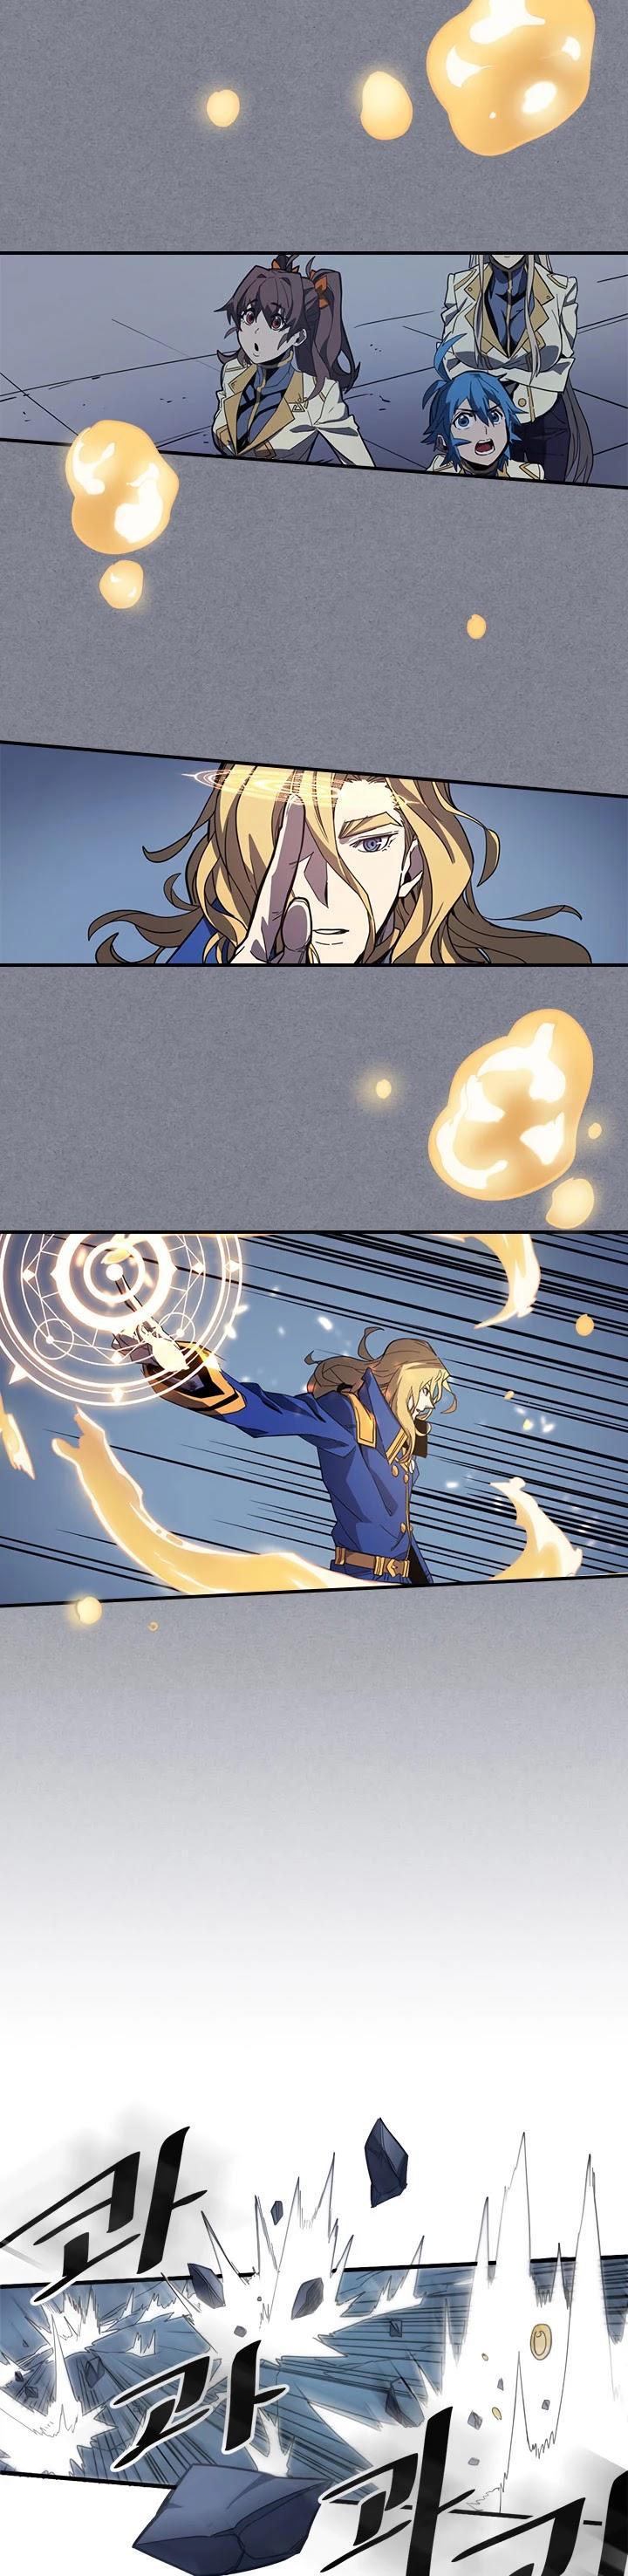 A Returner's Magic Should Be Special Chapter 103 page 3 - Mangakakalots.com